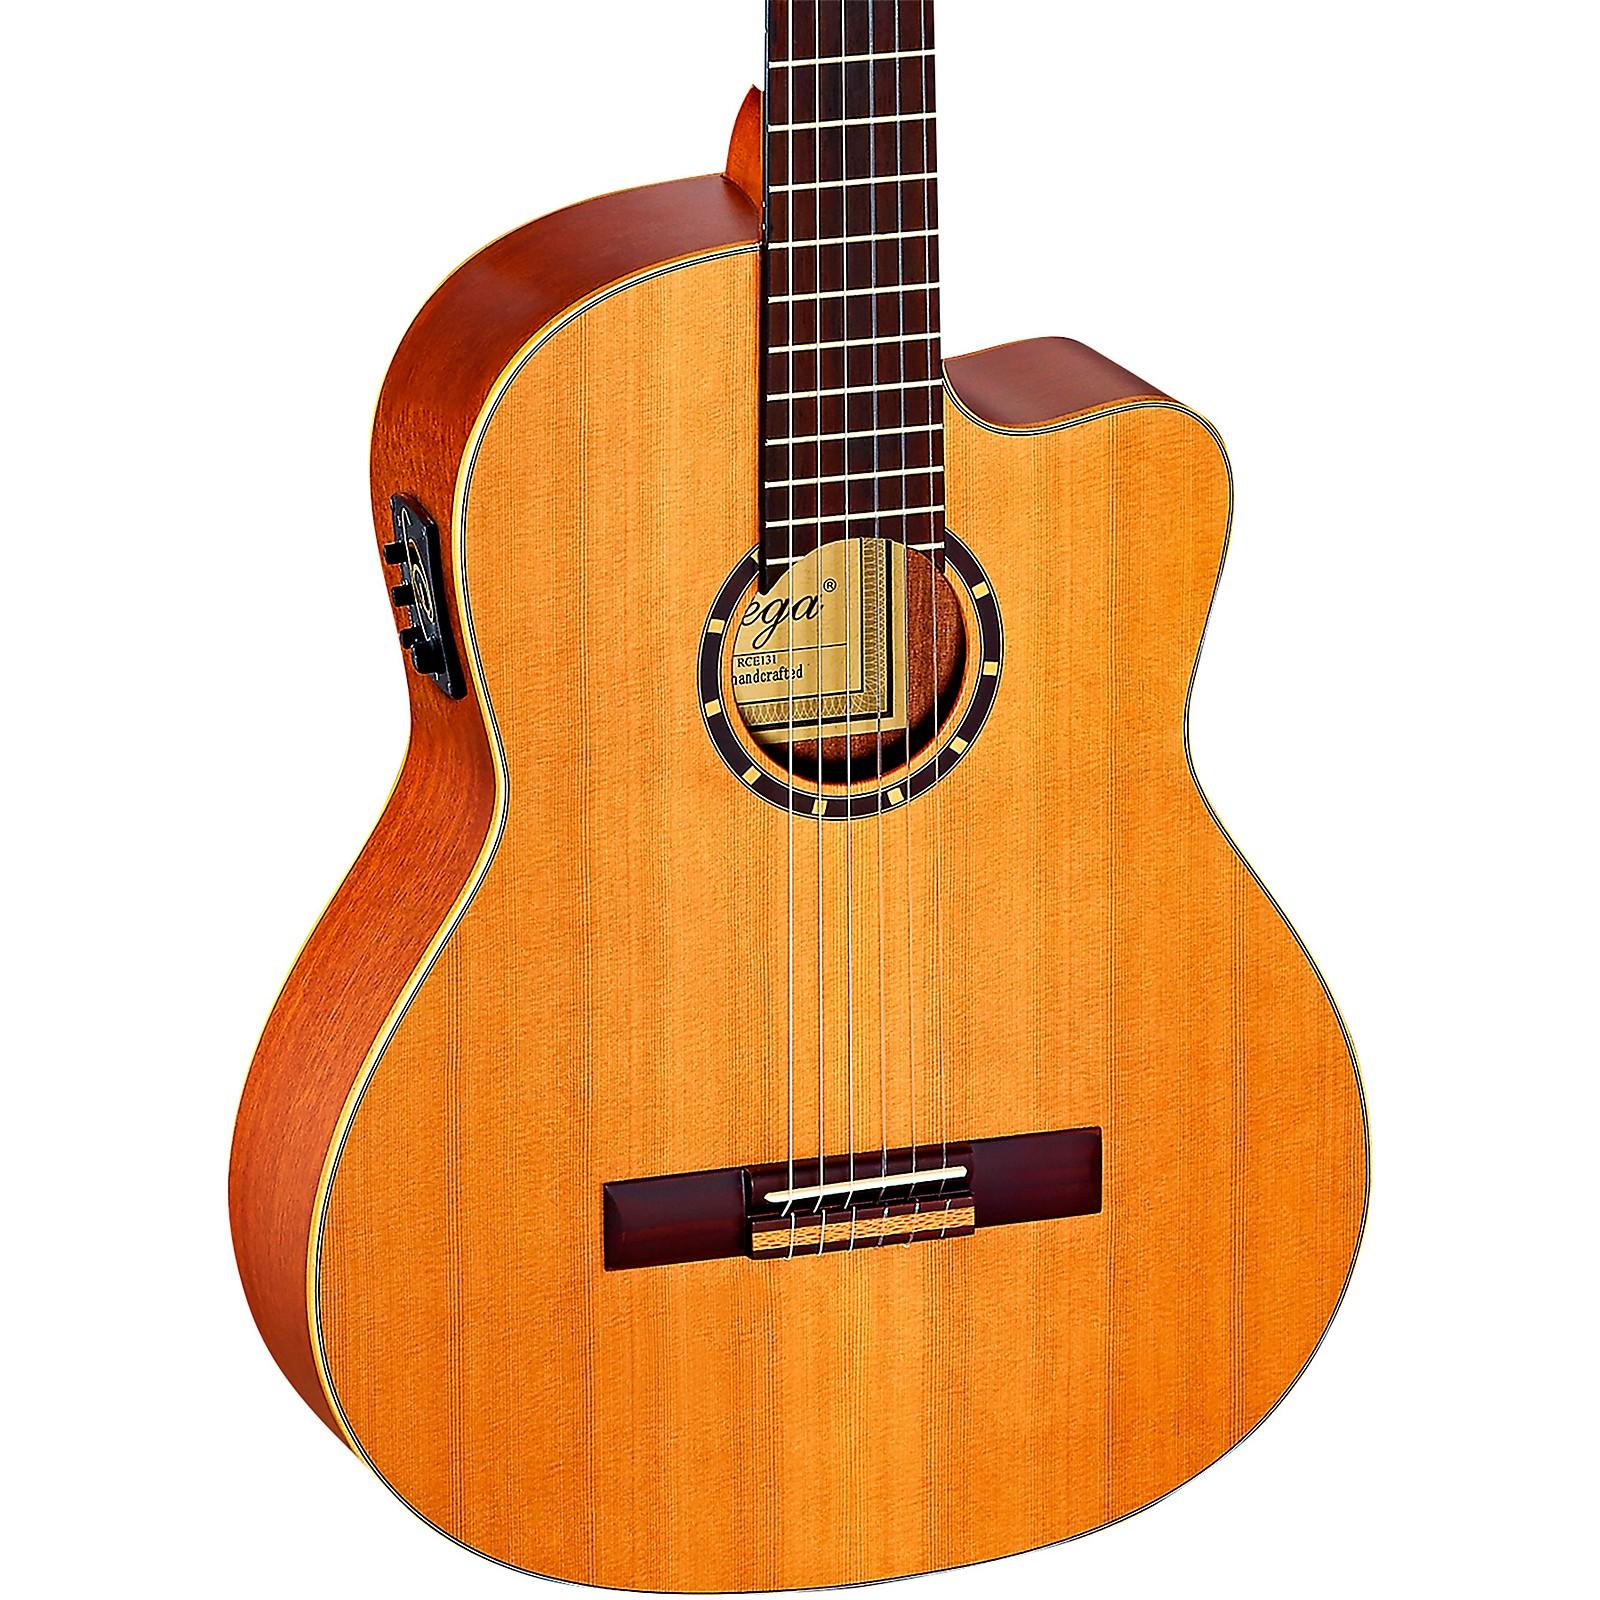 Ortega Family Series Pro RCE131 Acoustic-Electric Classical Guitar